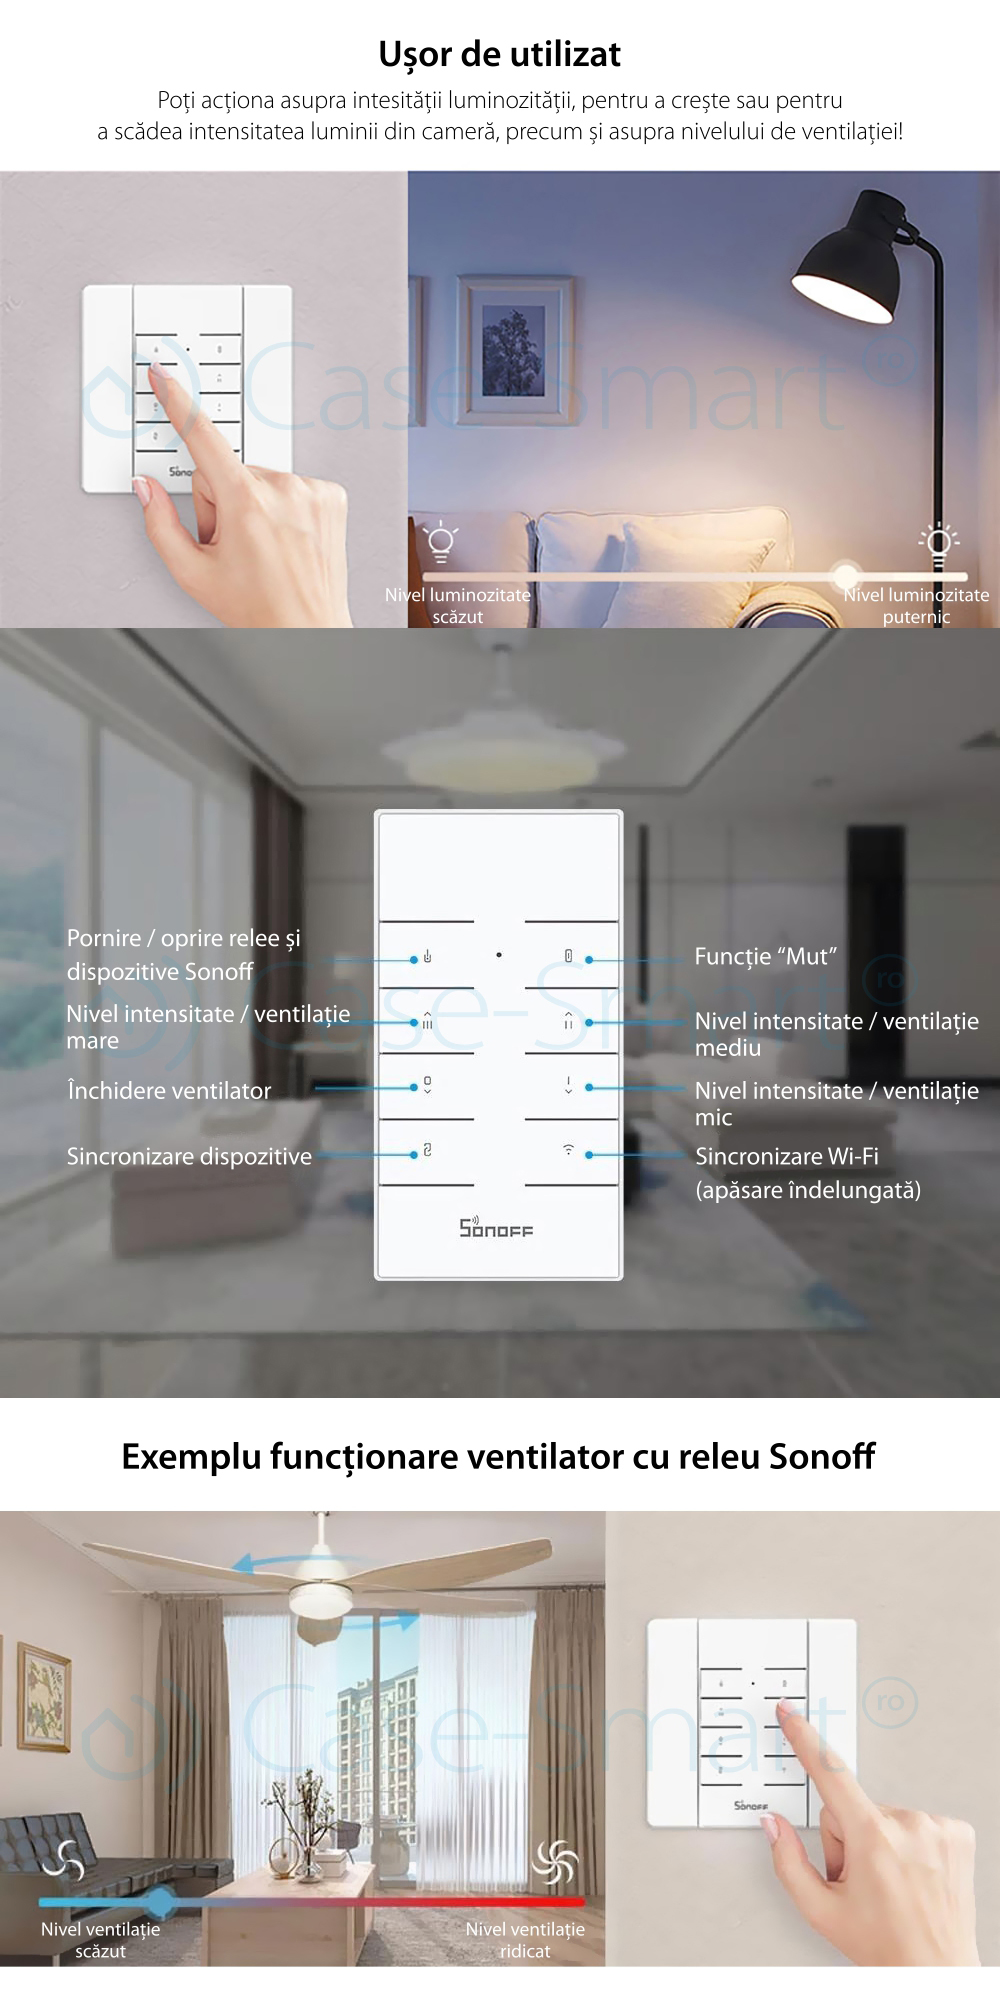 Pachet Suport perete + Telecomanda RF Sonoff RM433 cu Functie Sincronizare Wi-Fi, Reglaj intensitate lumini, Reglaj viteza ventilator